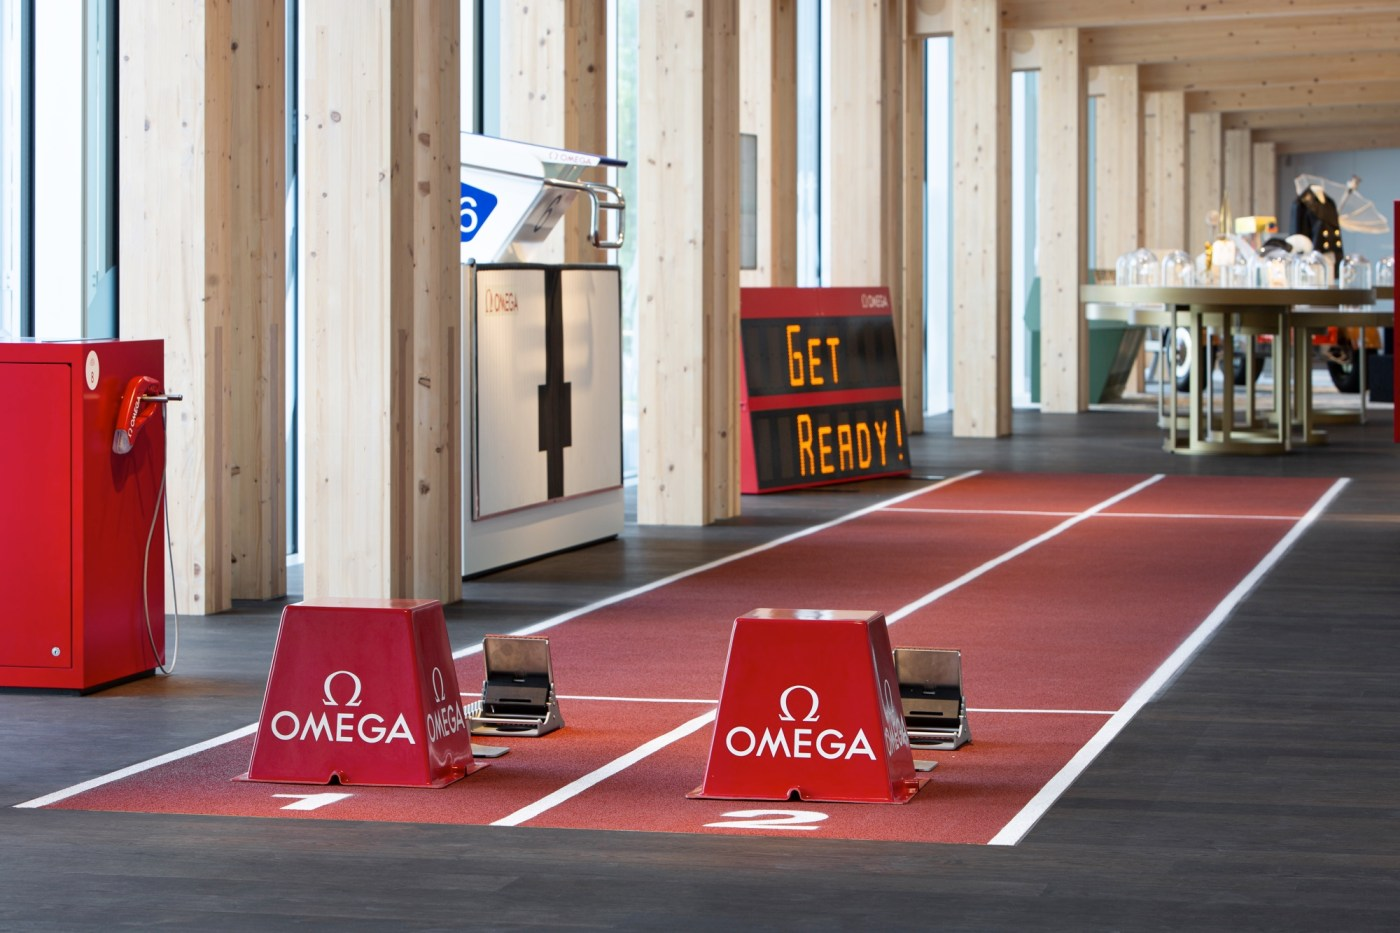 Omega museum indoor track